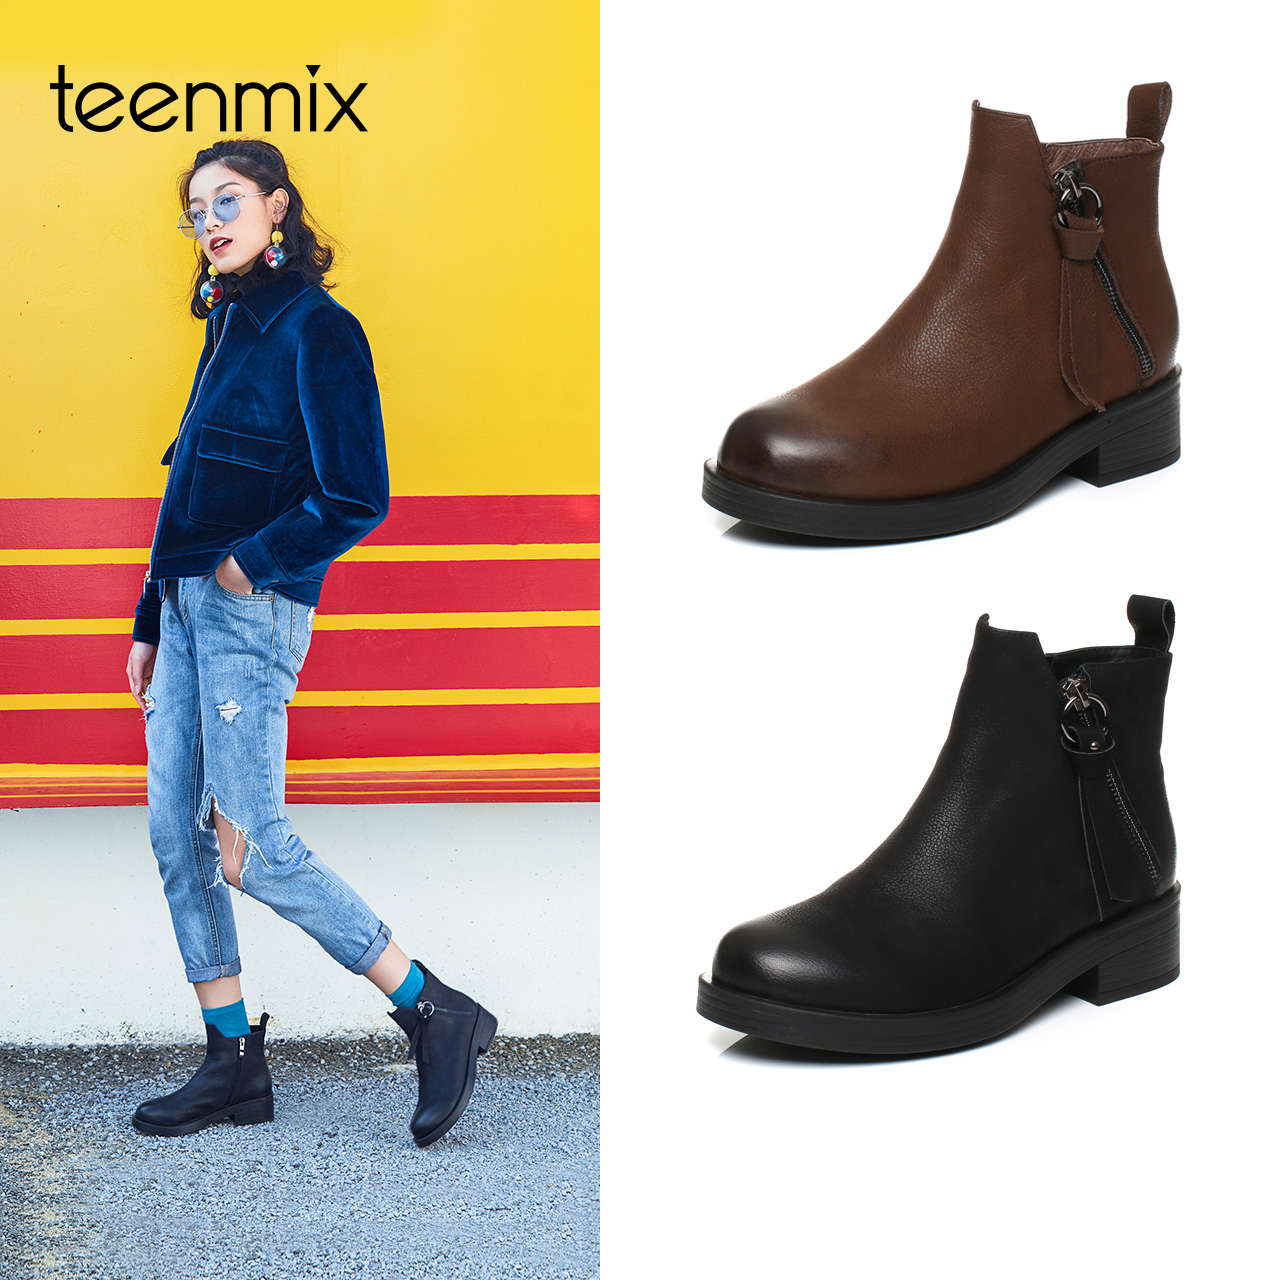 Teenmix-天美意冬专柜同款牛皮时尚简约素雅女短靴AQ371DD7